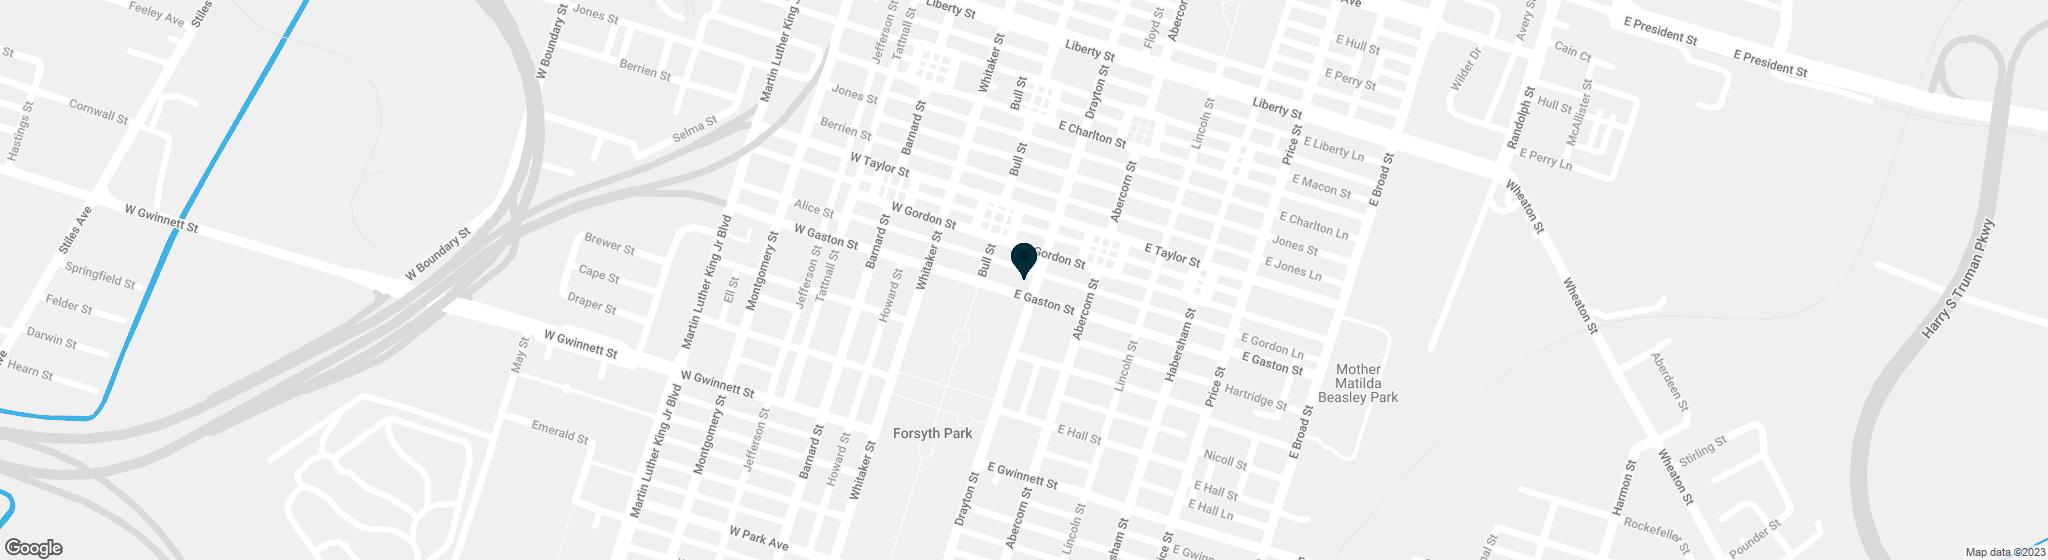 26 E Gaston Street Savannah GA 31401